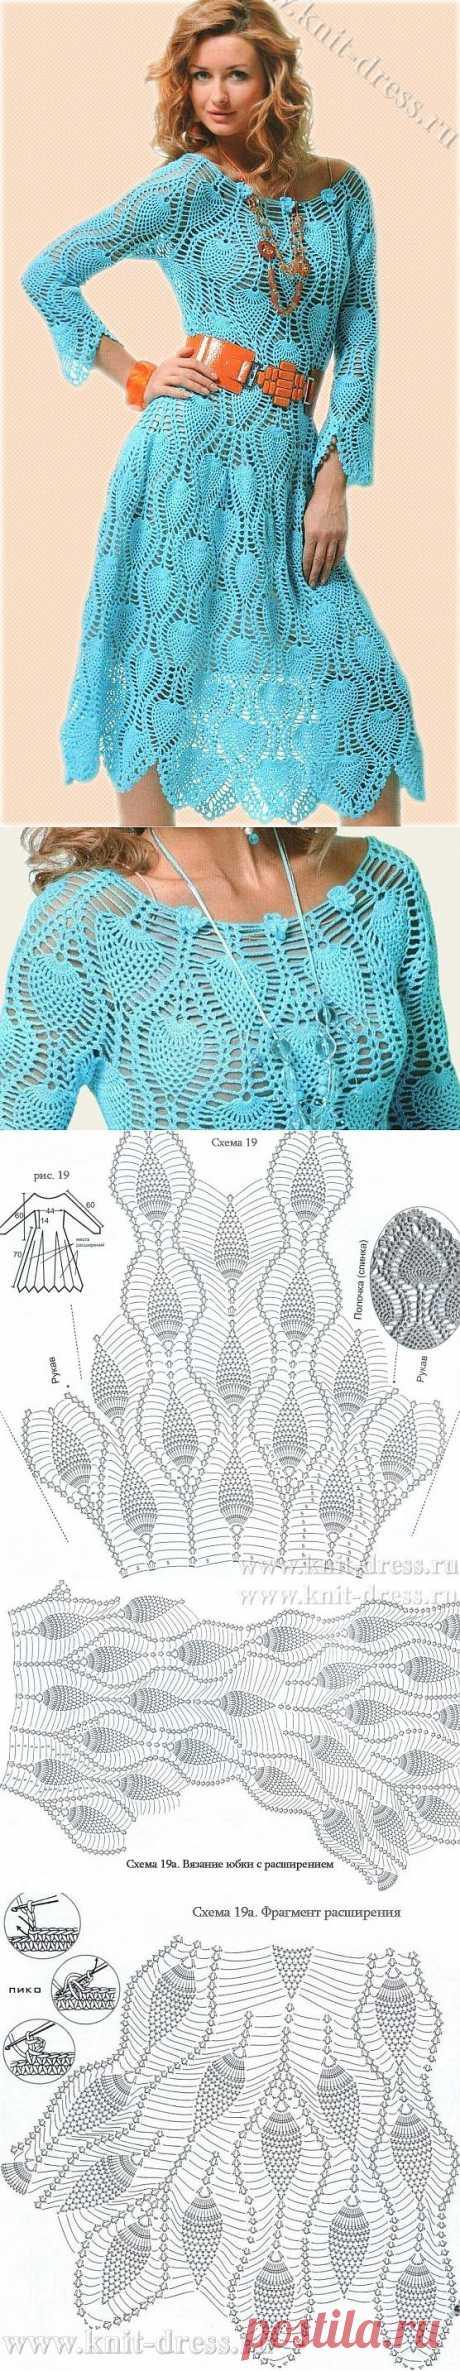 Платье крючком узором Ананас